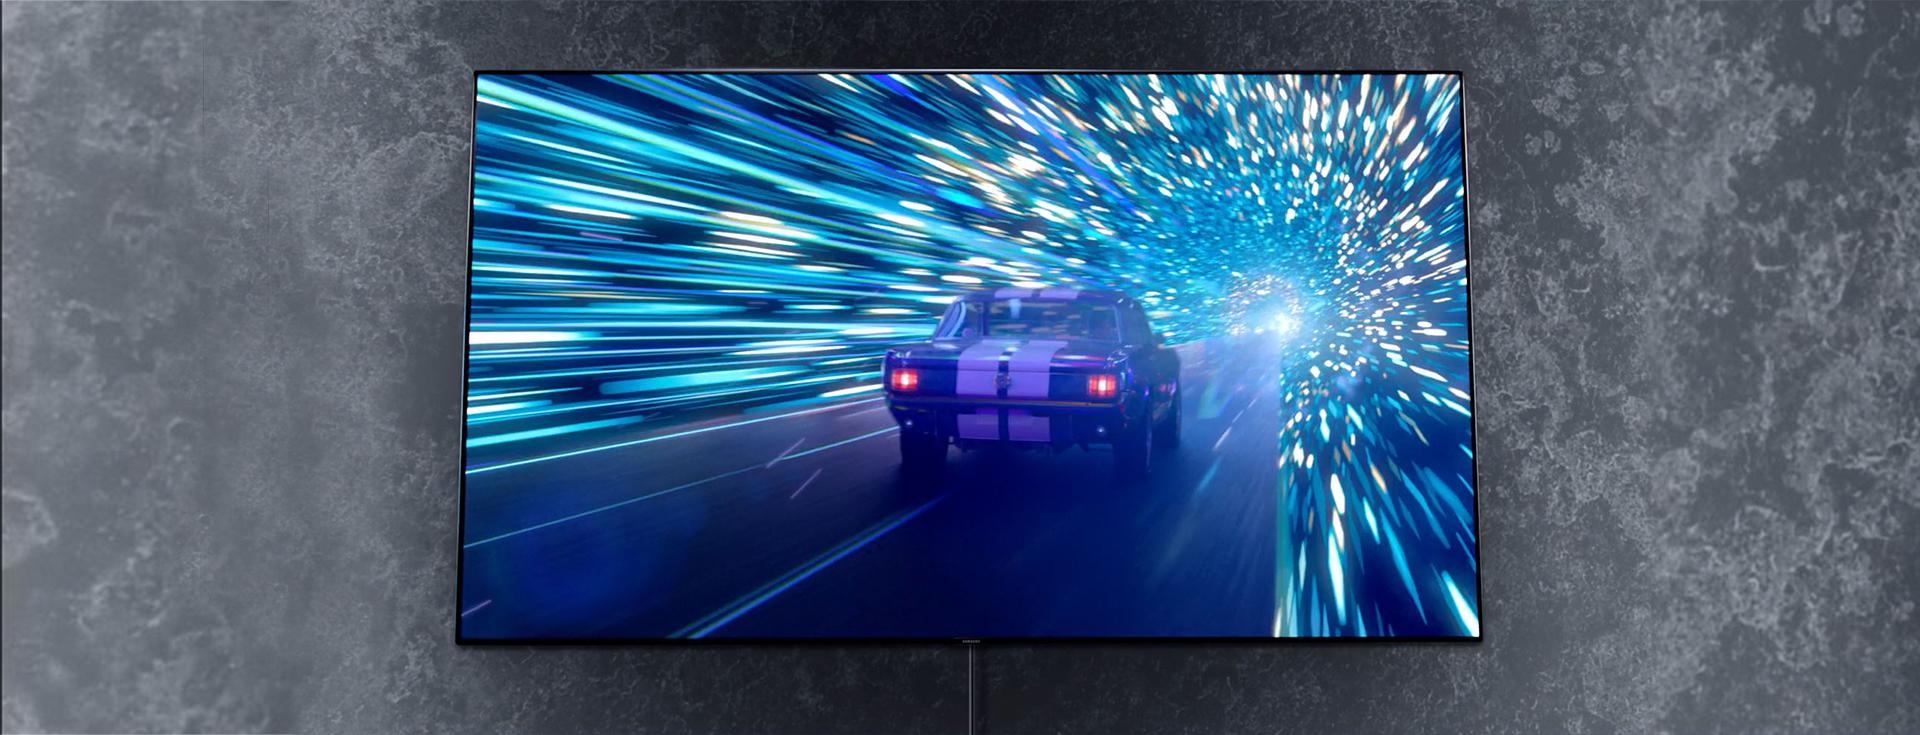 Samsung QLED TV Welcome Movie.